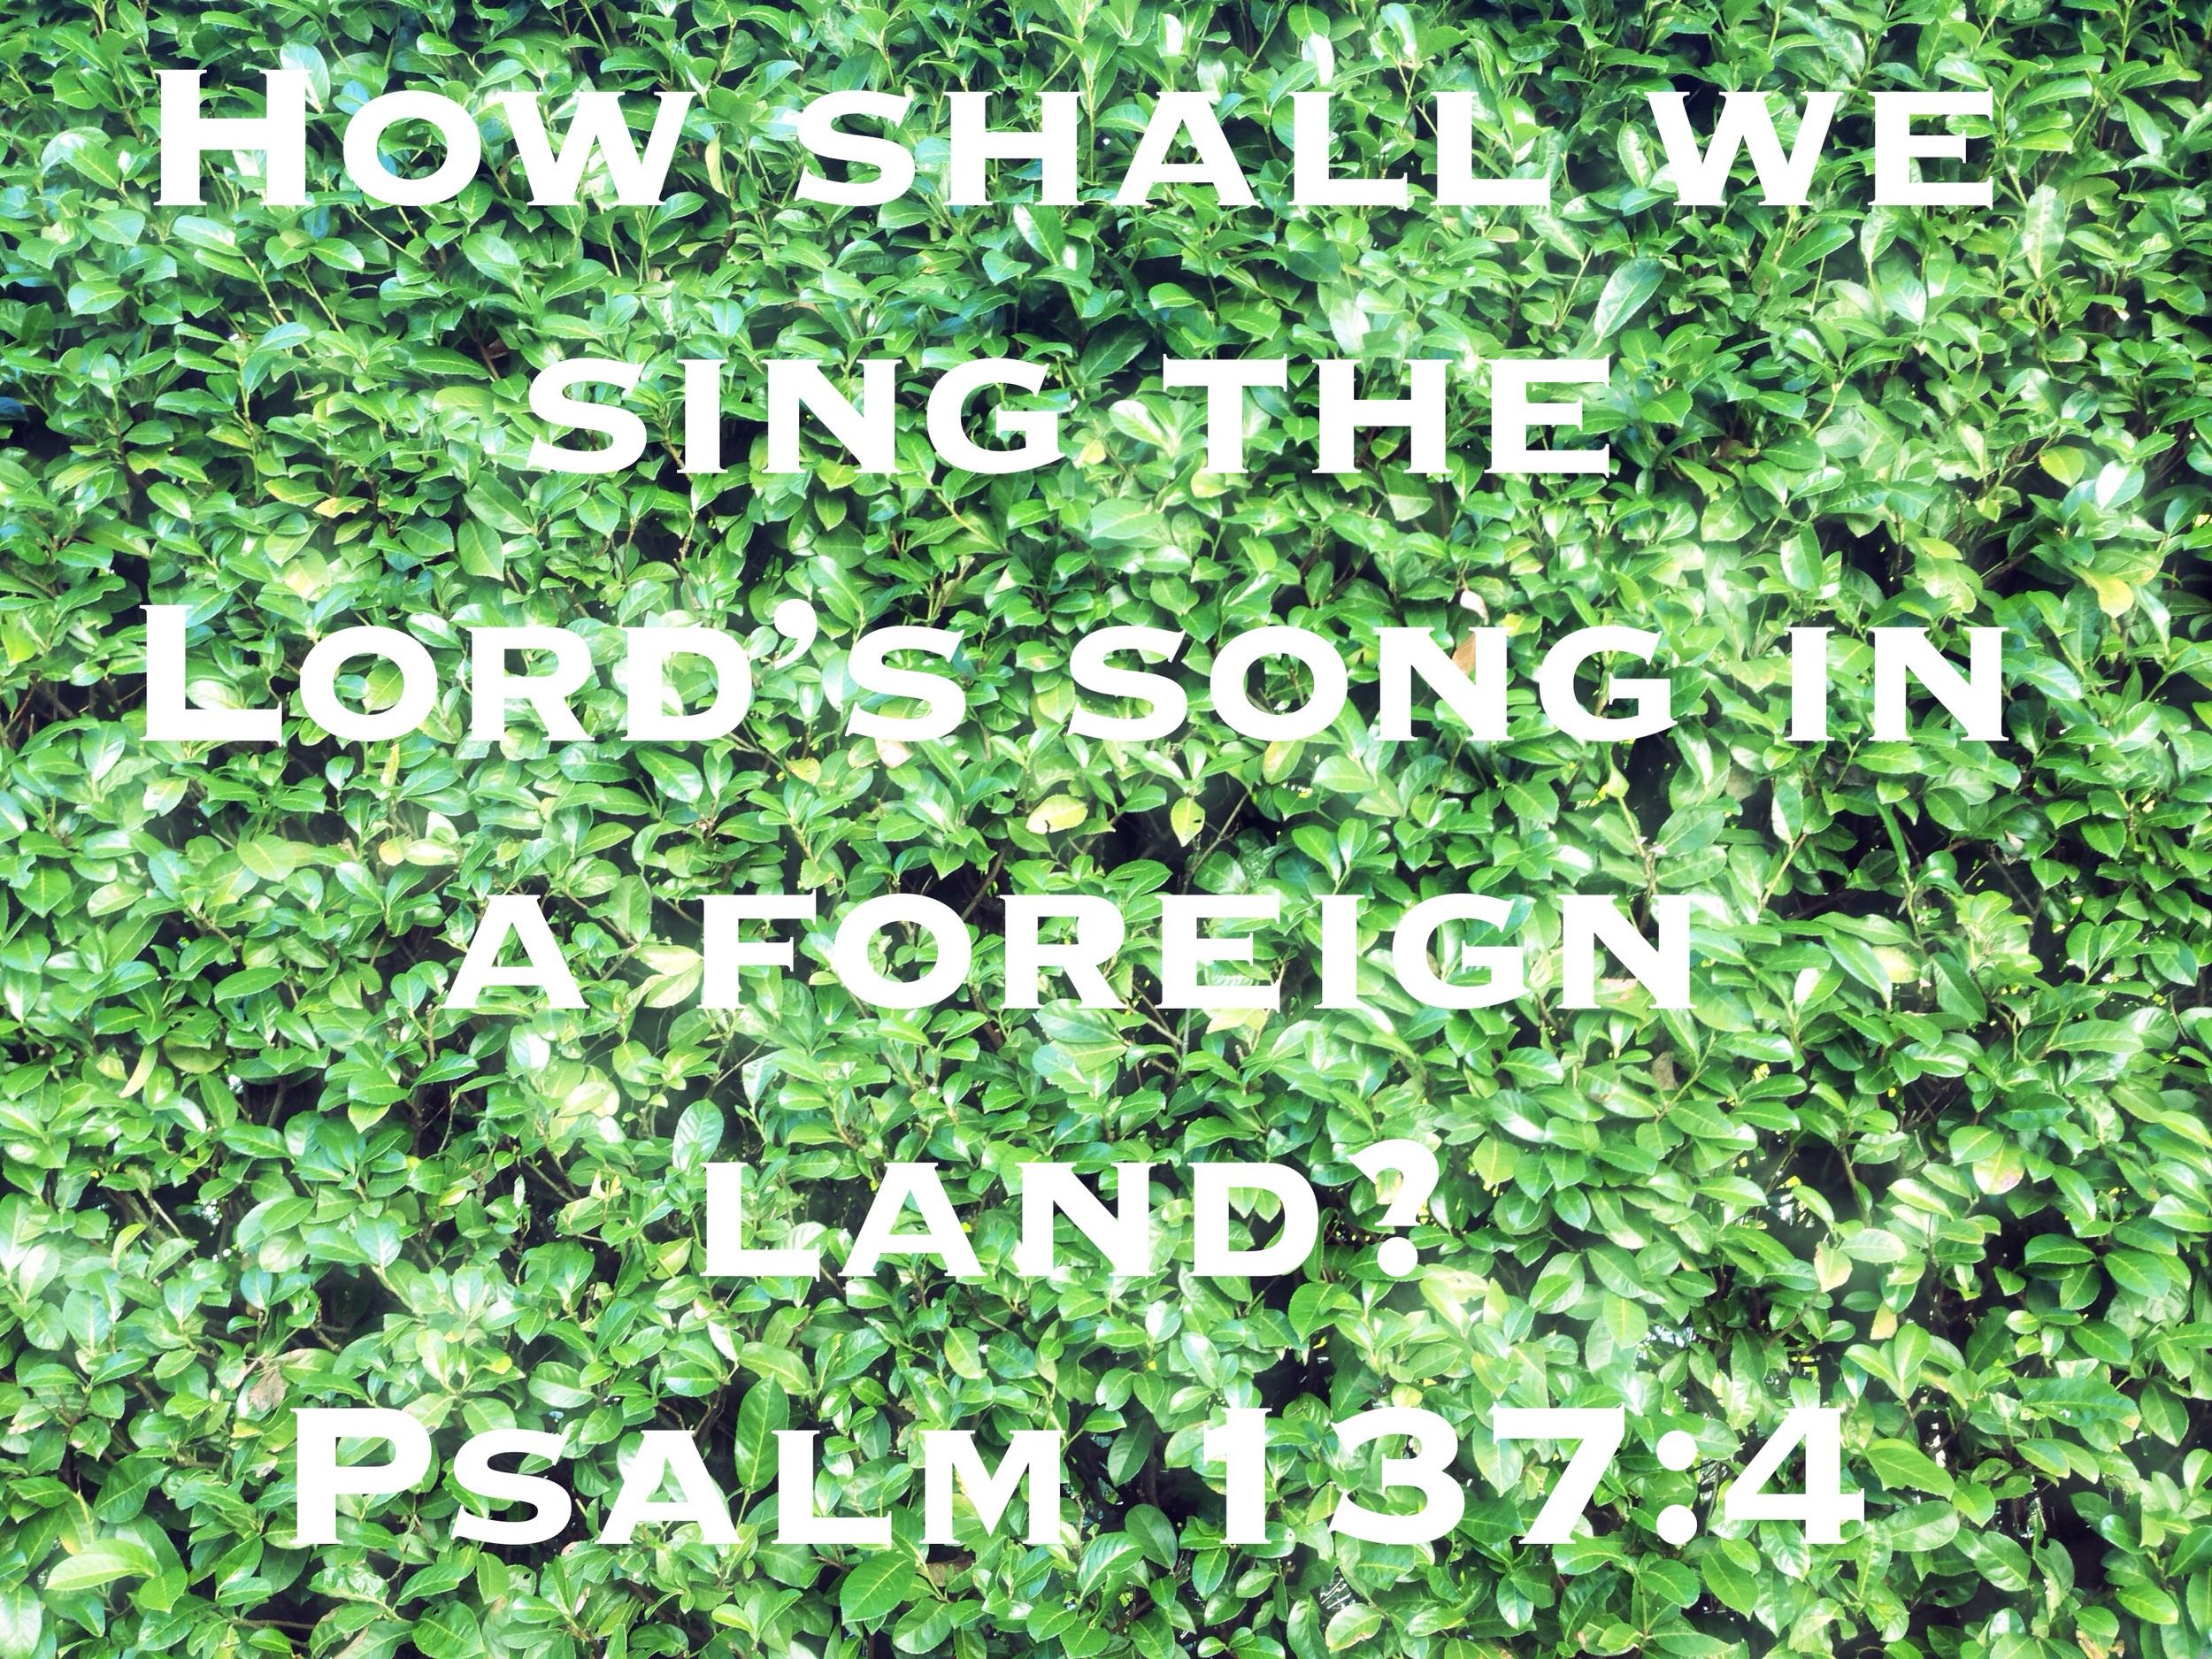 Psalm 137 via nadinewouldsay